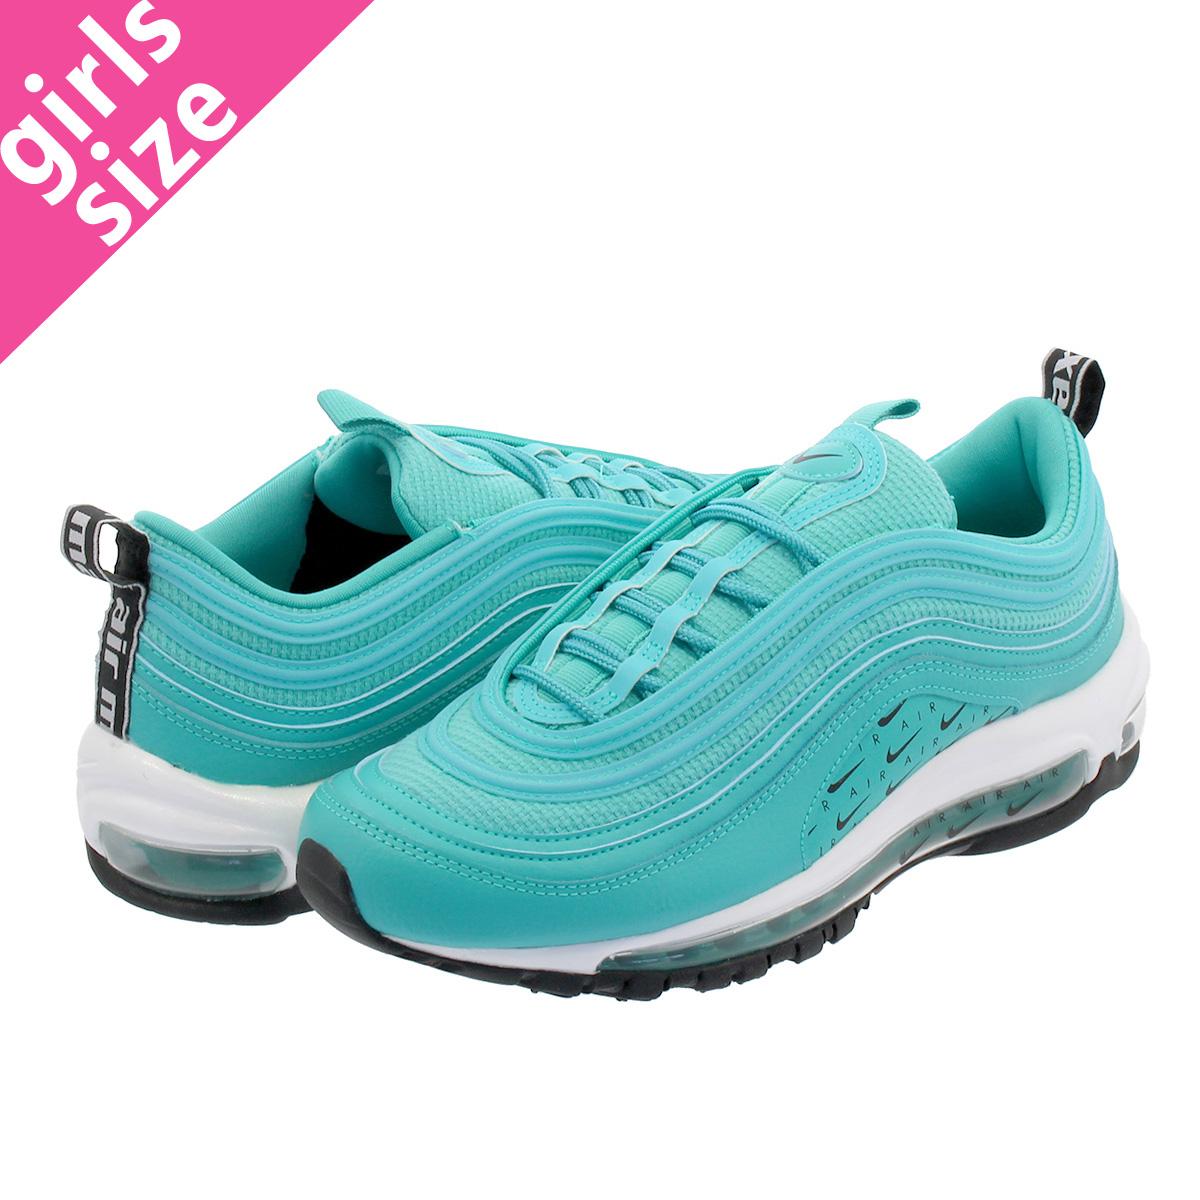 NIKE WMNS AIR MAX 97 LX Nike women Air Max 97 LX HYPER JADEHYPER JADEBLACKWHITE ar7621 300